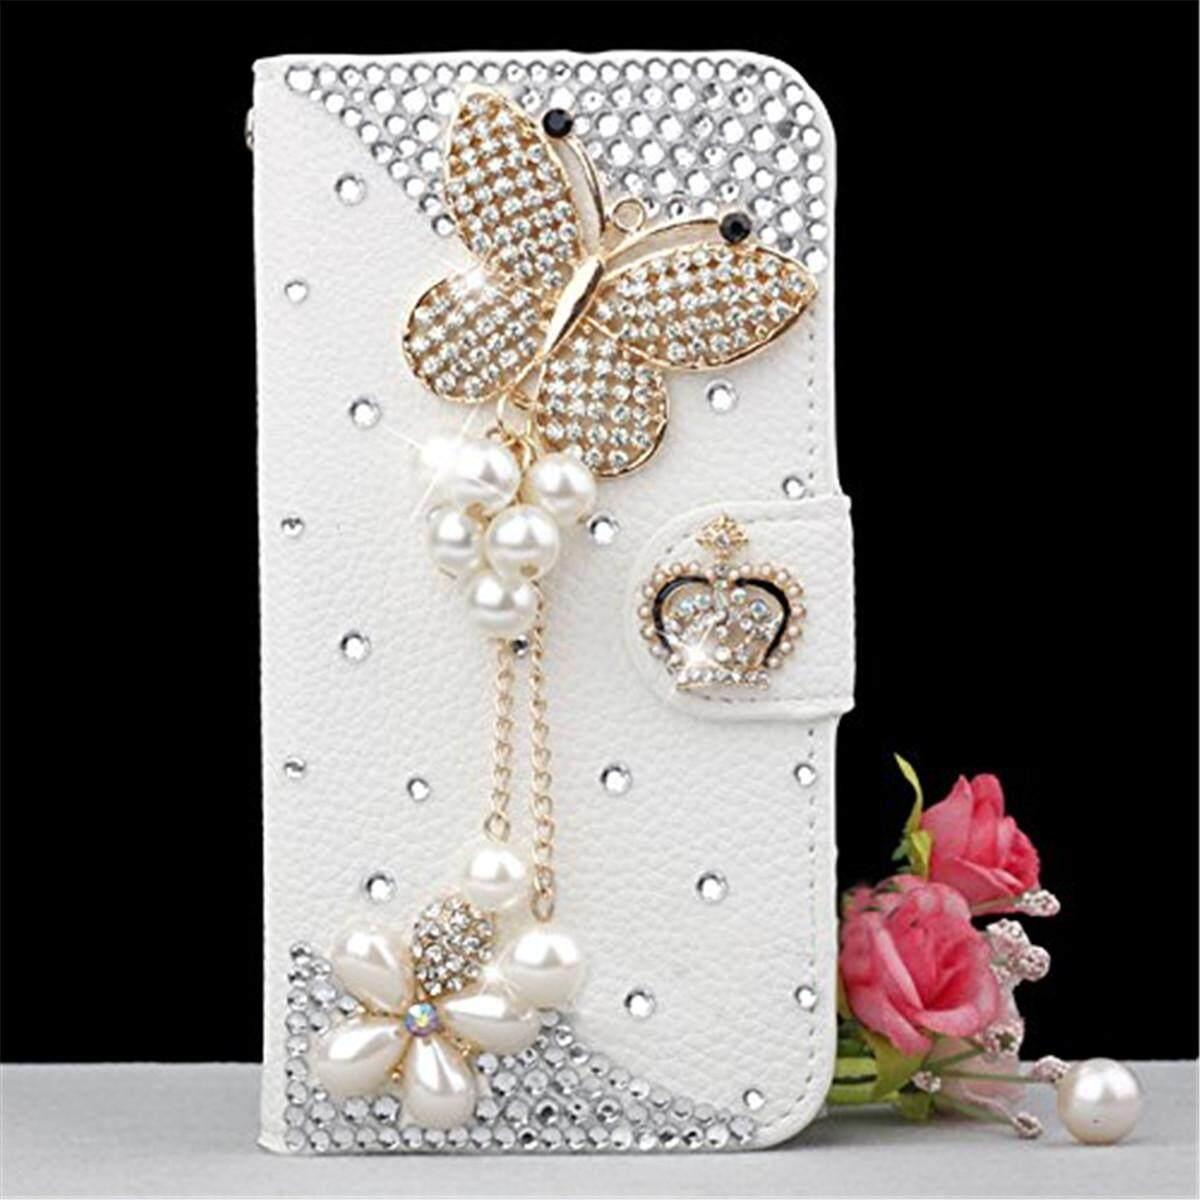 Update Harga Leather Case Magnetic Closure Flip Cover For Samsung Calandiva Premium Front Back Galaxy A6 Plus 2018 60 Inch Tg Merah Moonmini 3d Bling Diamond Rhinestones Pu Wallet